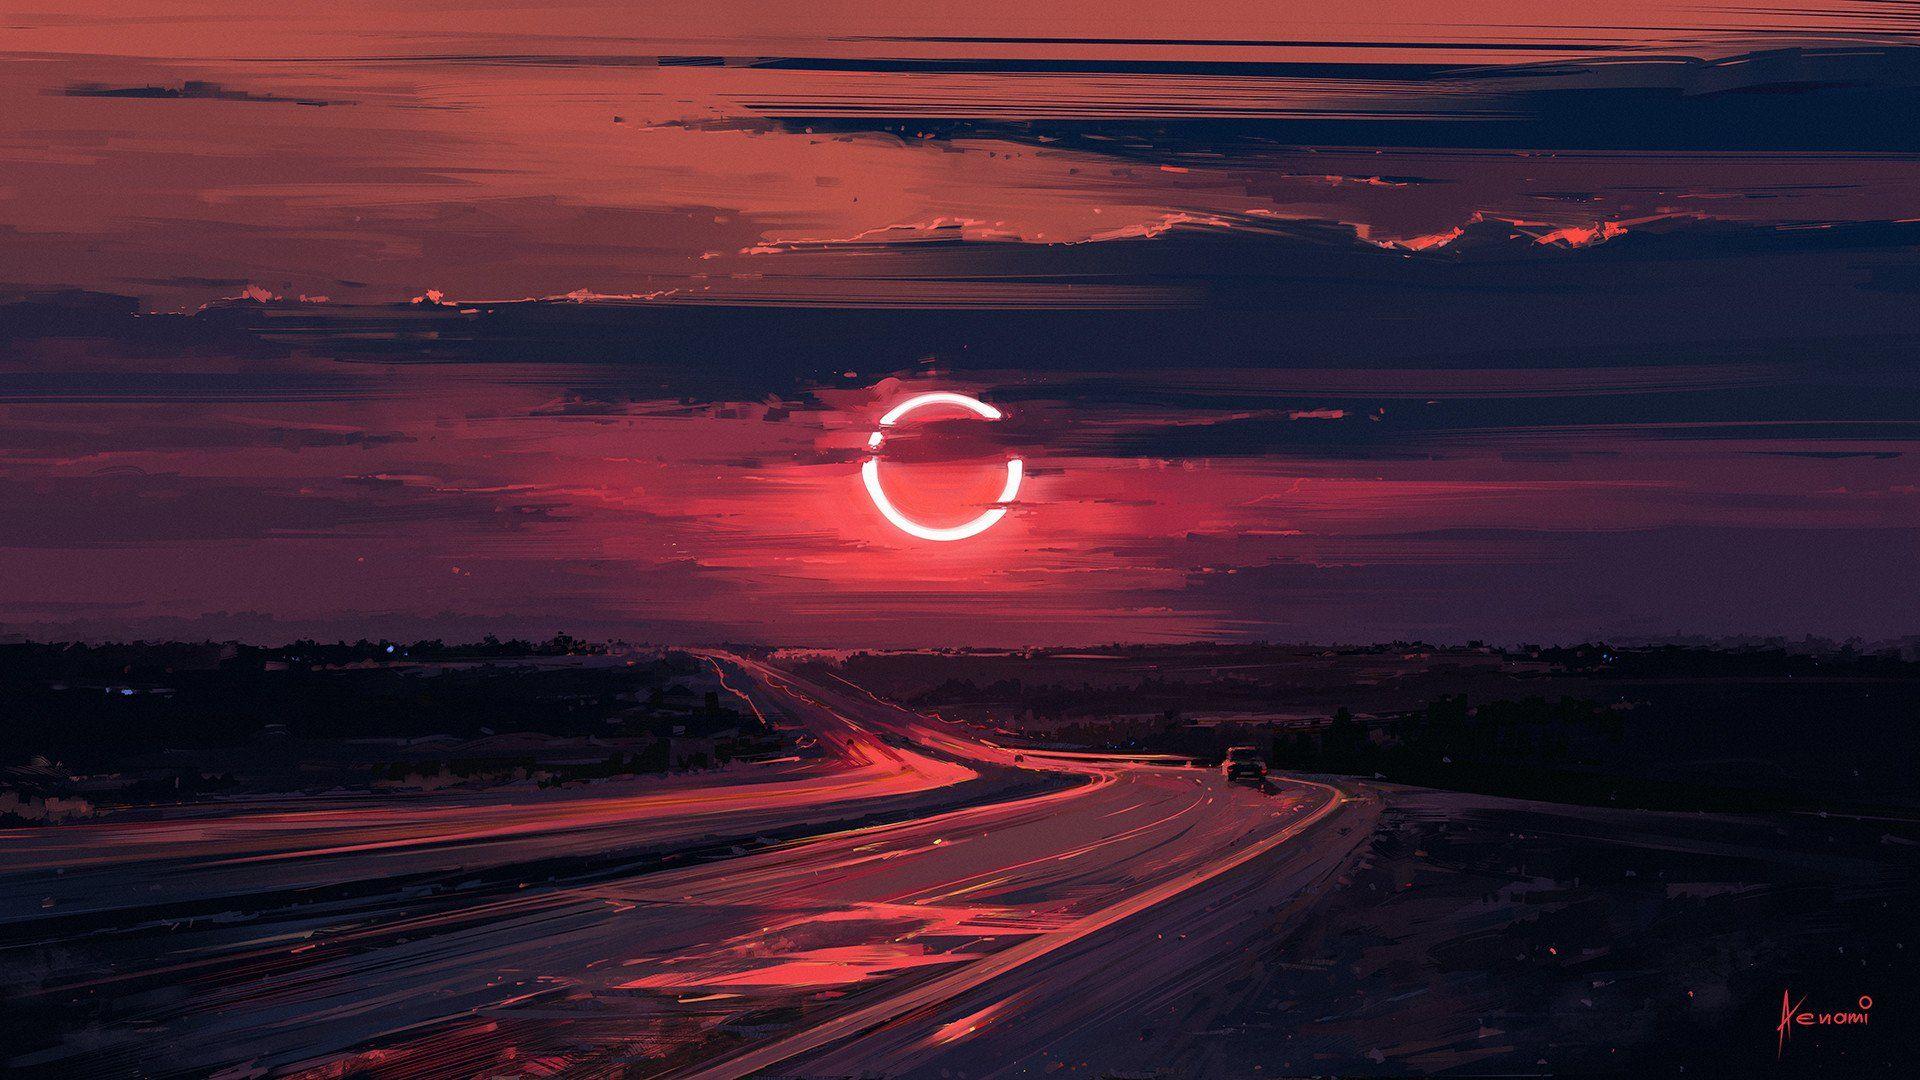 Fantasy Moon Eclipse Evening Cloud Road Artwork Wallpaper Colorful Landscape Scenery Wallpaper Desktop Wallpaper Art Hd wallpaper sunset clouds road hills